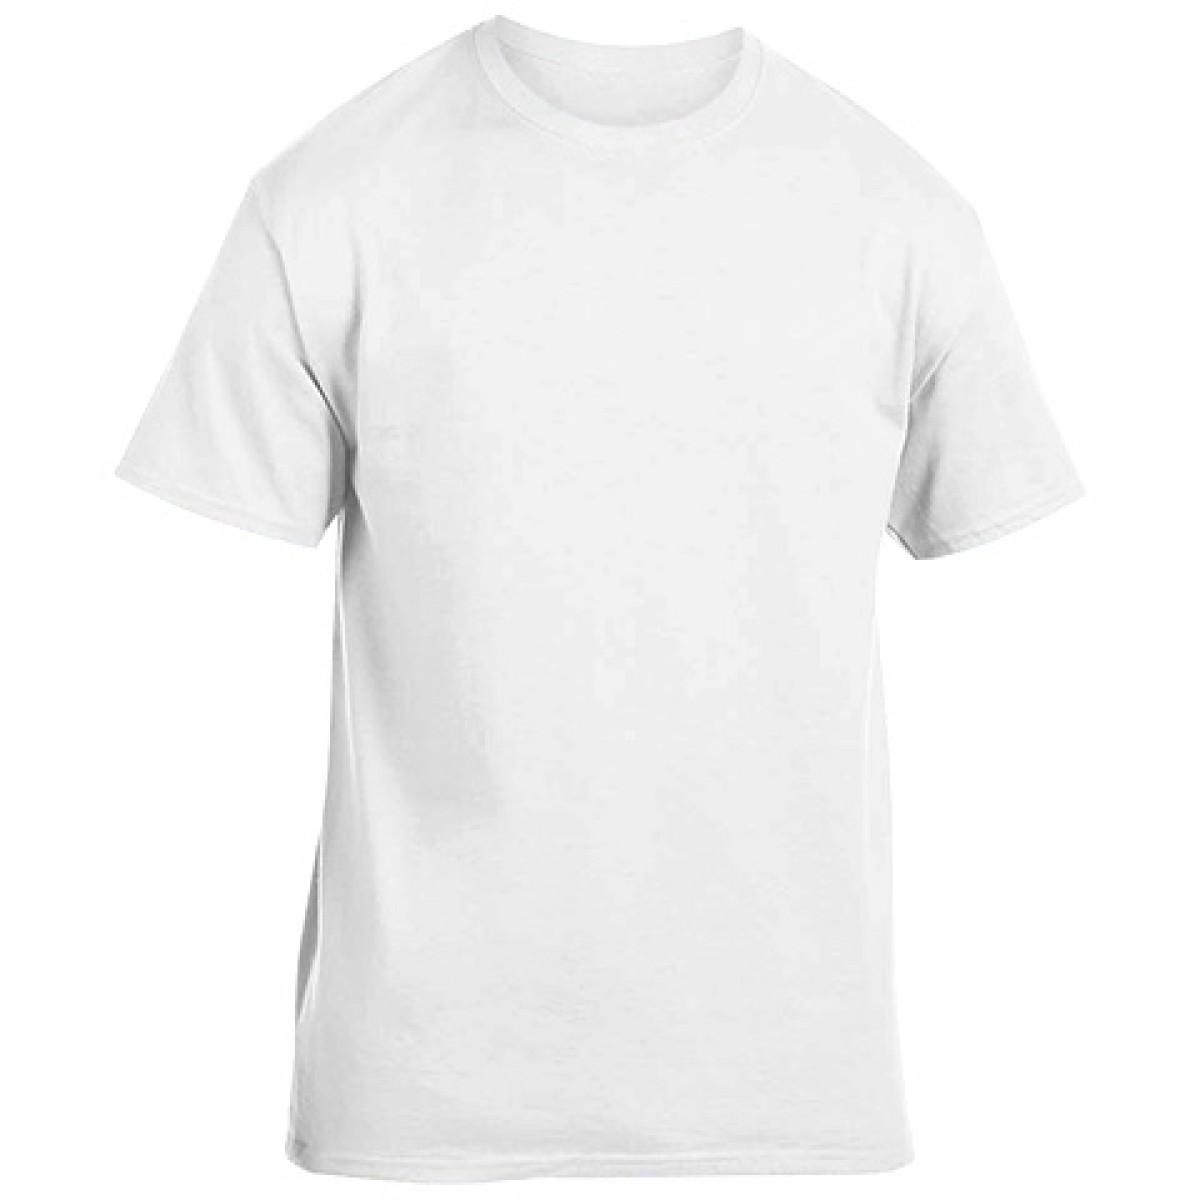 Cotton Short Sleeve T-Shirt - White